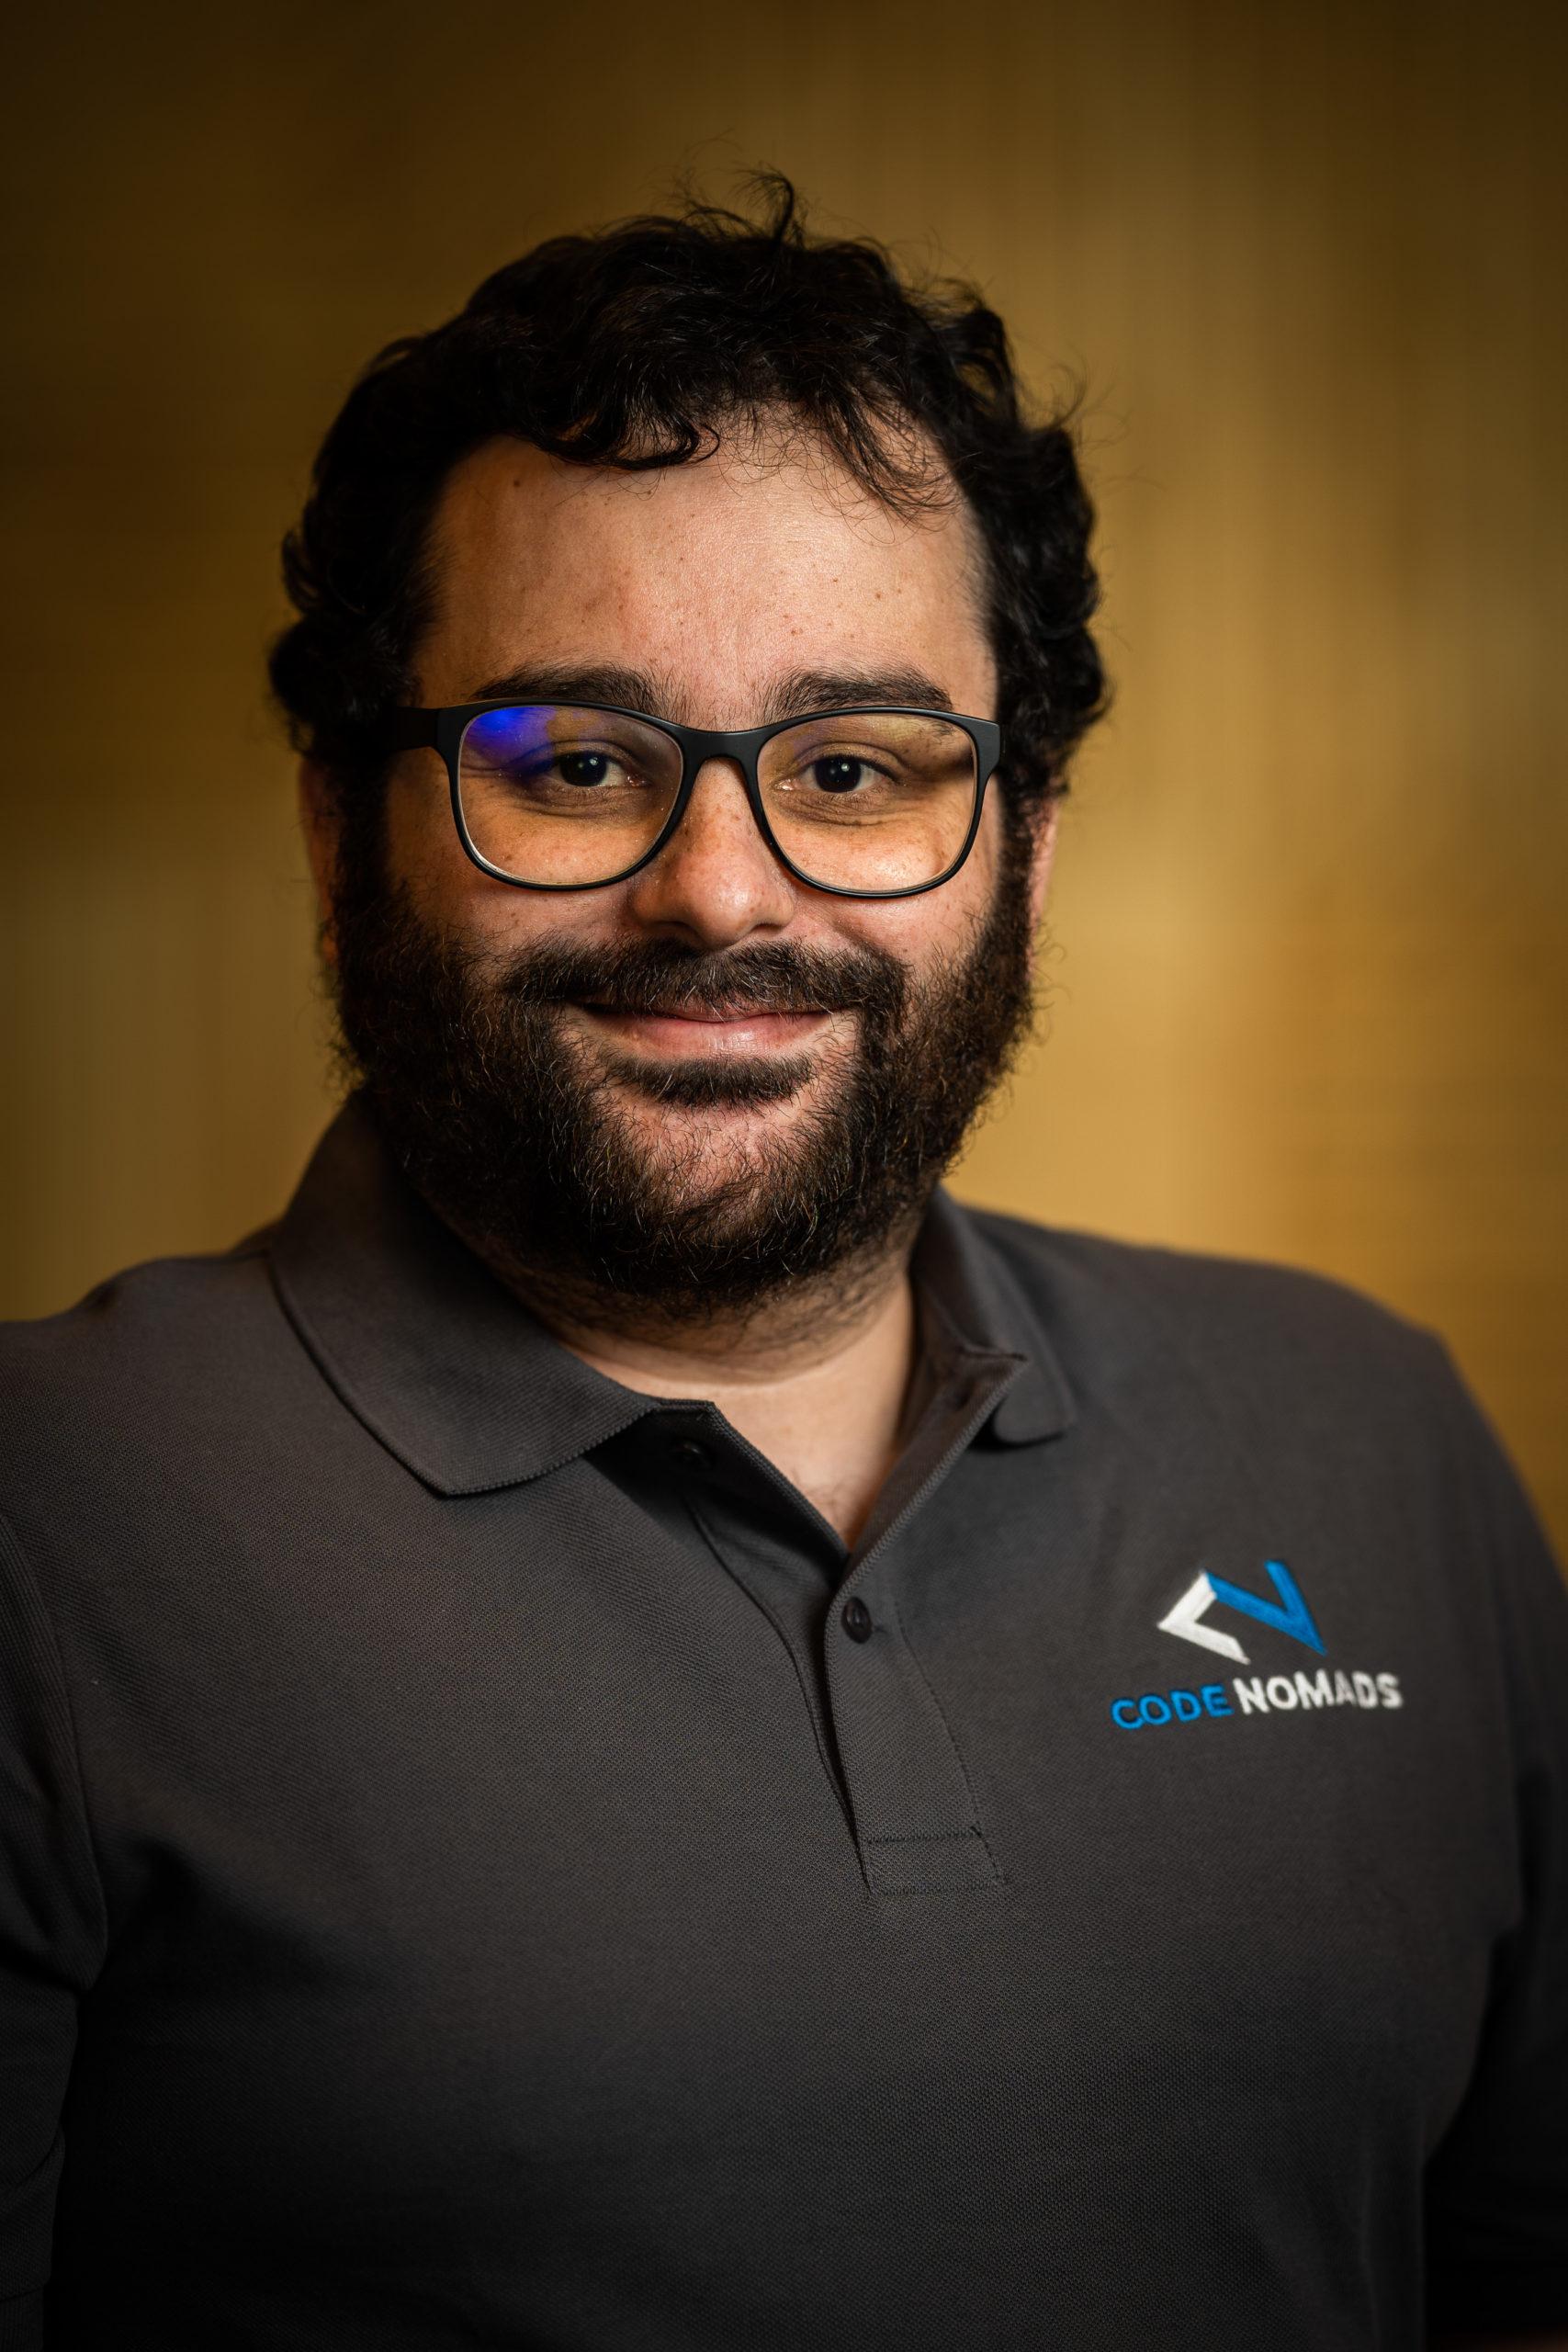 Raduan Silva dos Santos